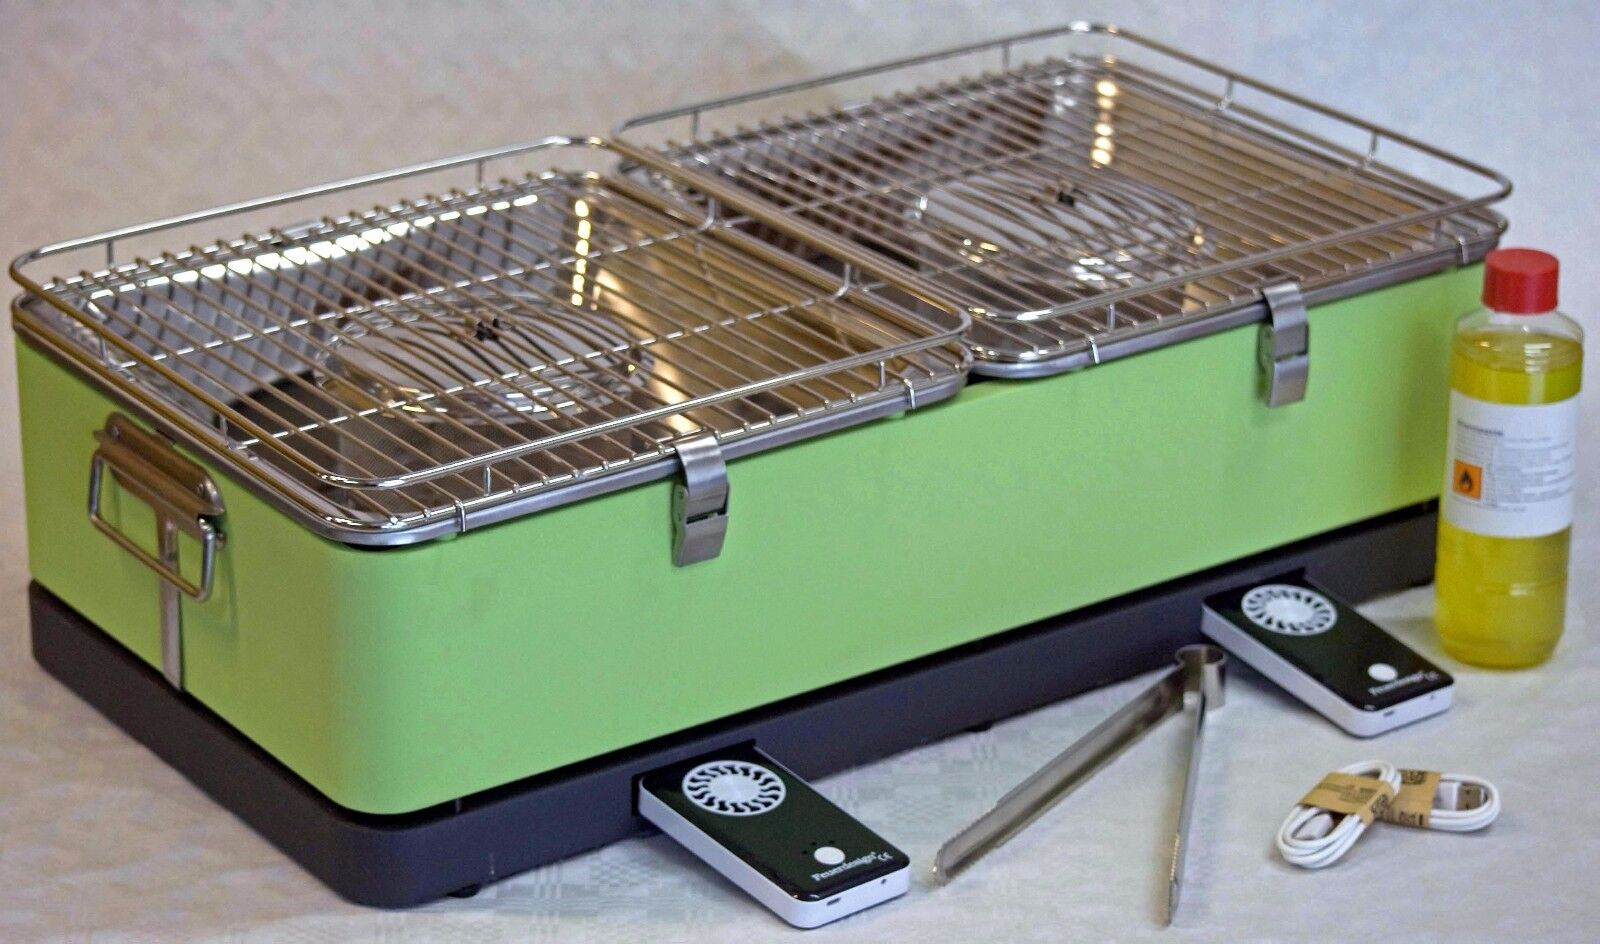 Landmann Gasgrill B Ware : Weber gasgrill b ware outdoor kitchens appliances kitchen kits bbq